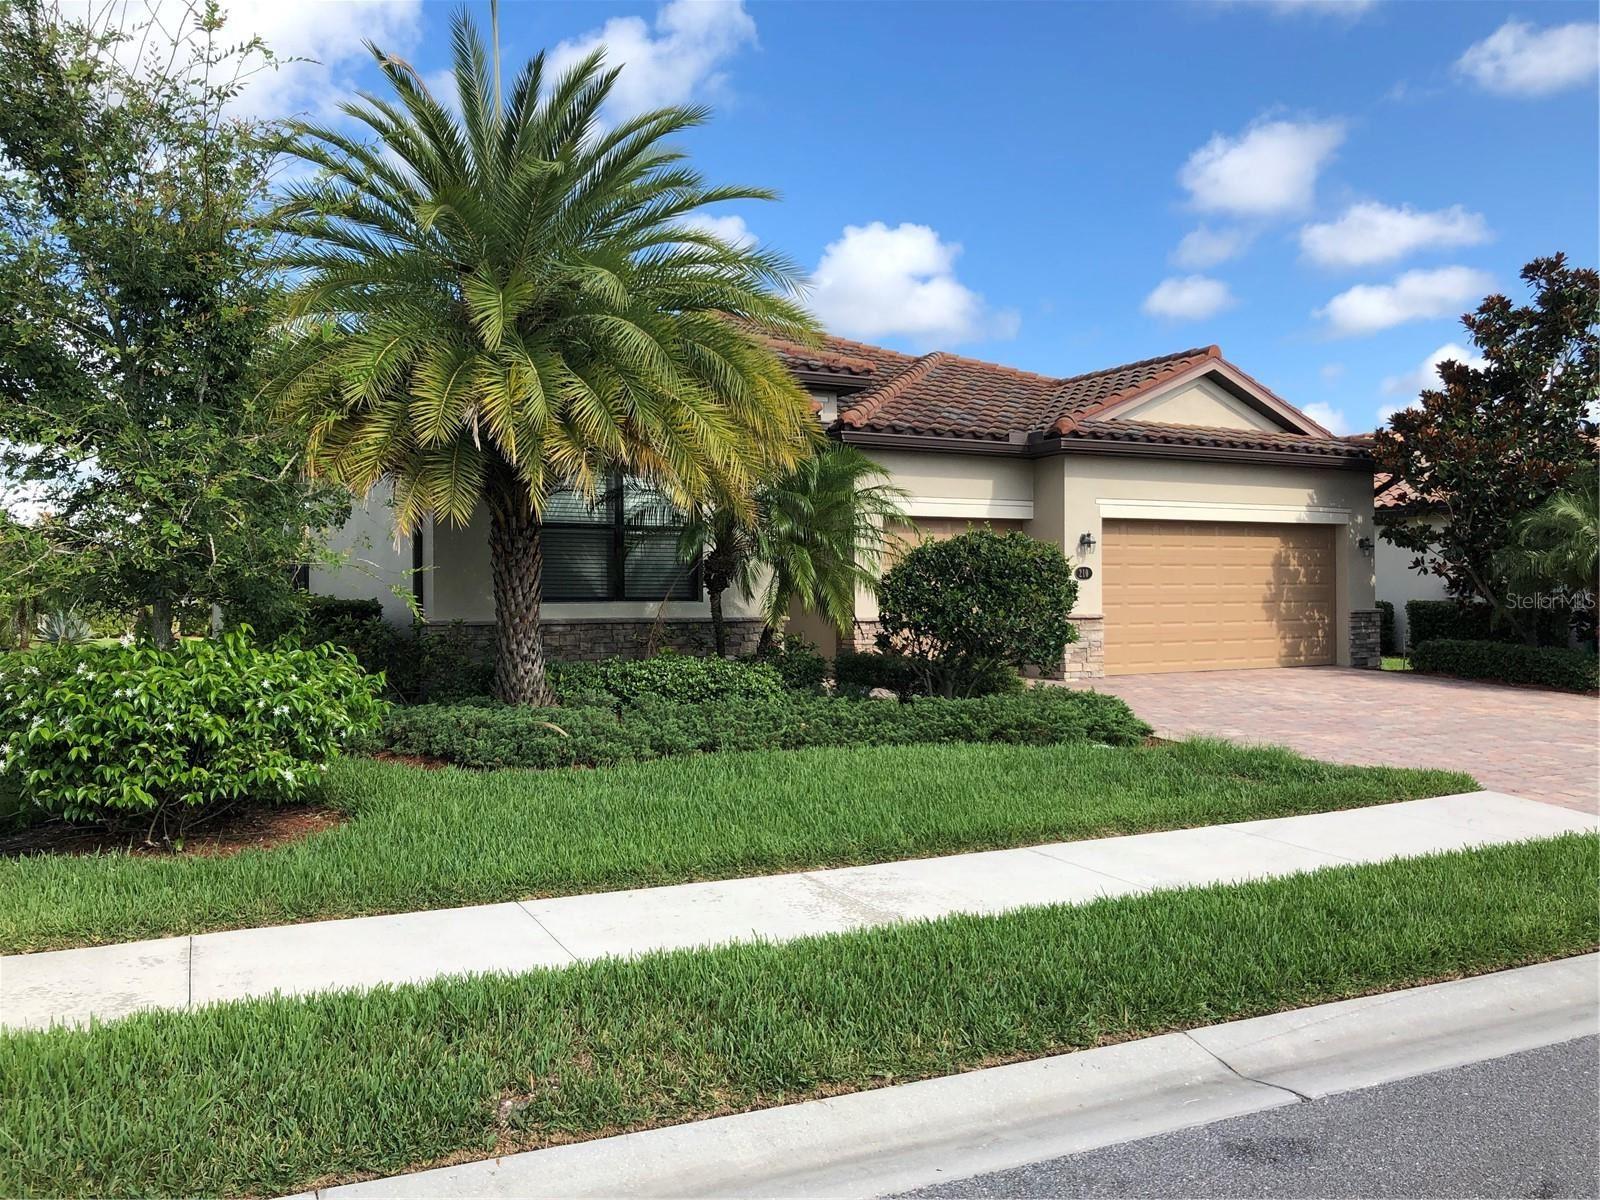 Photo of 210 WHISPERING PALMS LANE, BRADENTON, FL 34212 (MLS # A4503575)